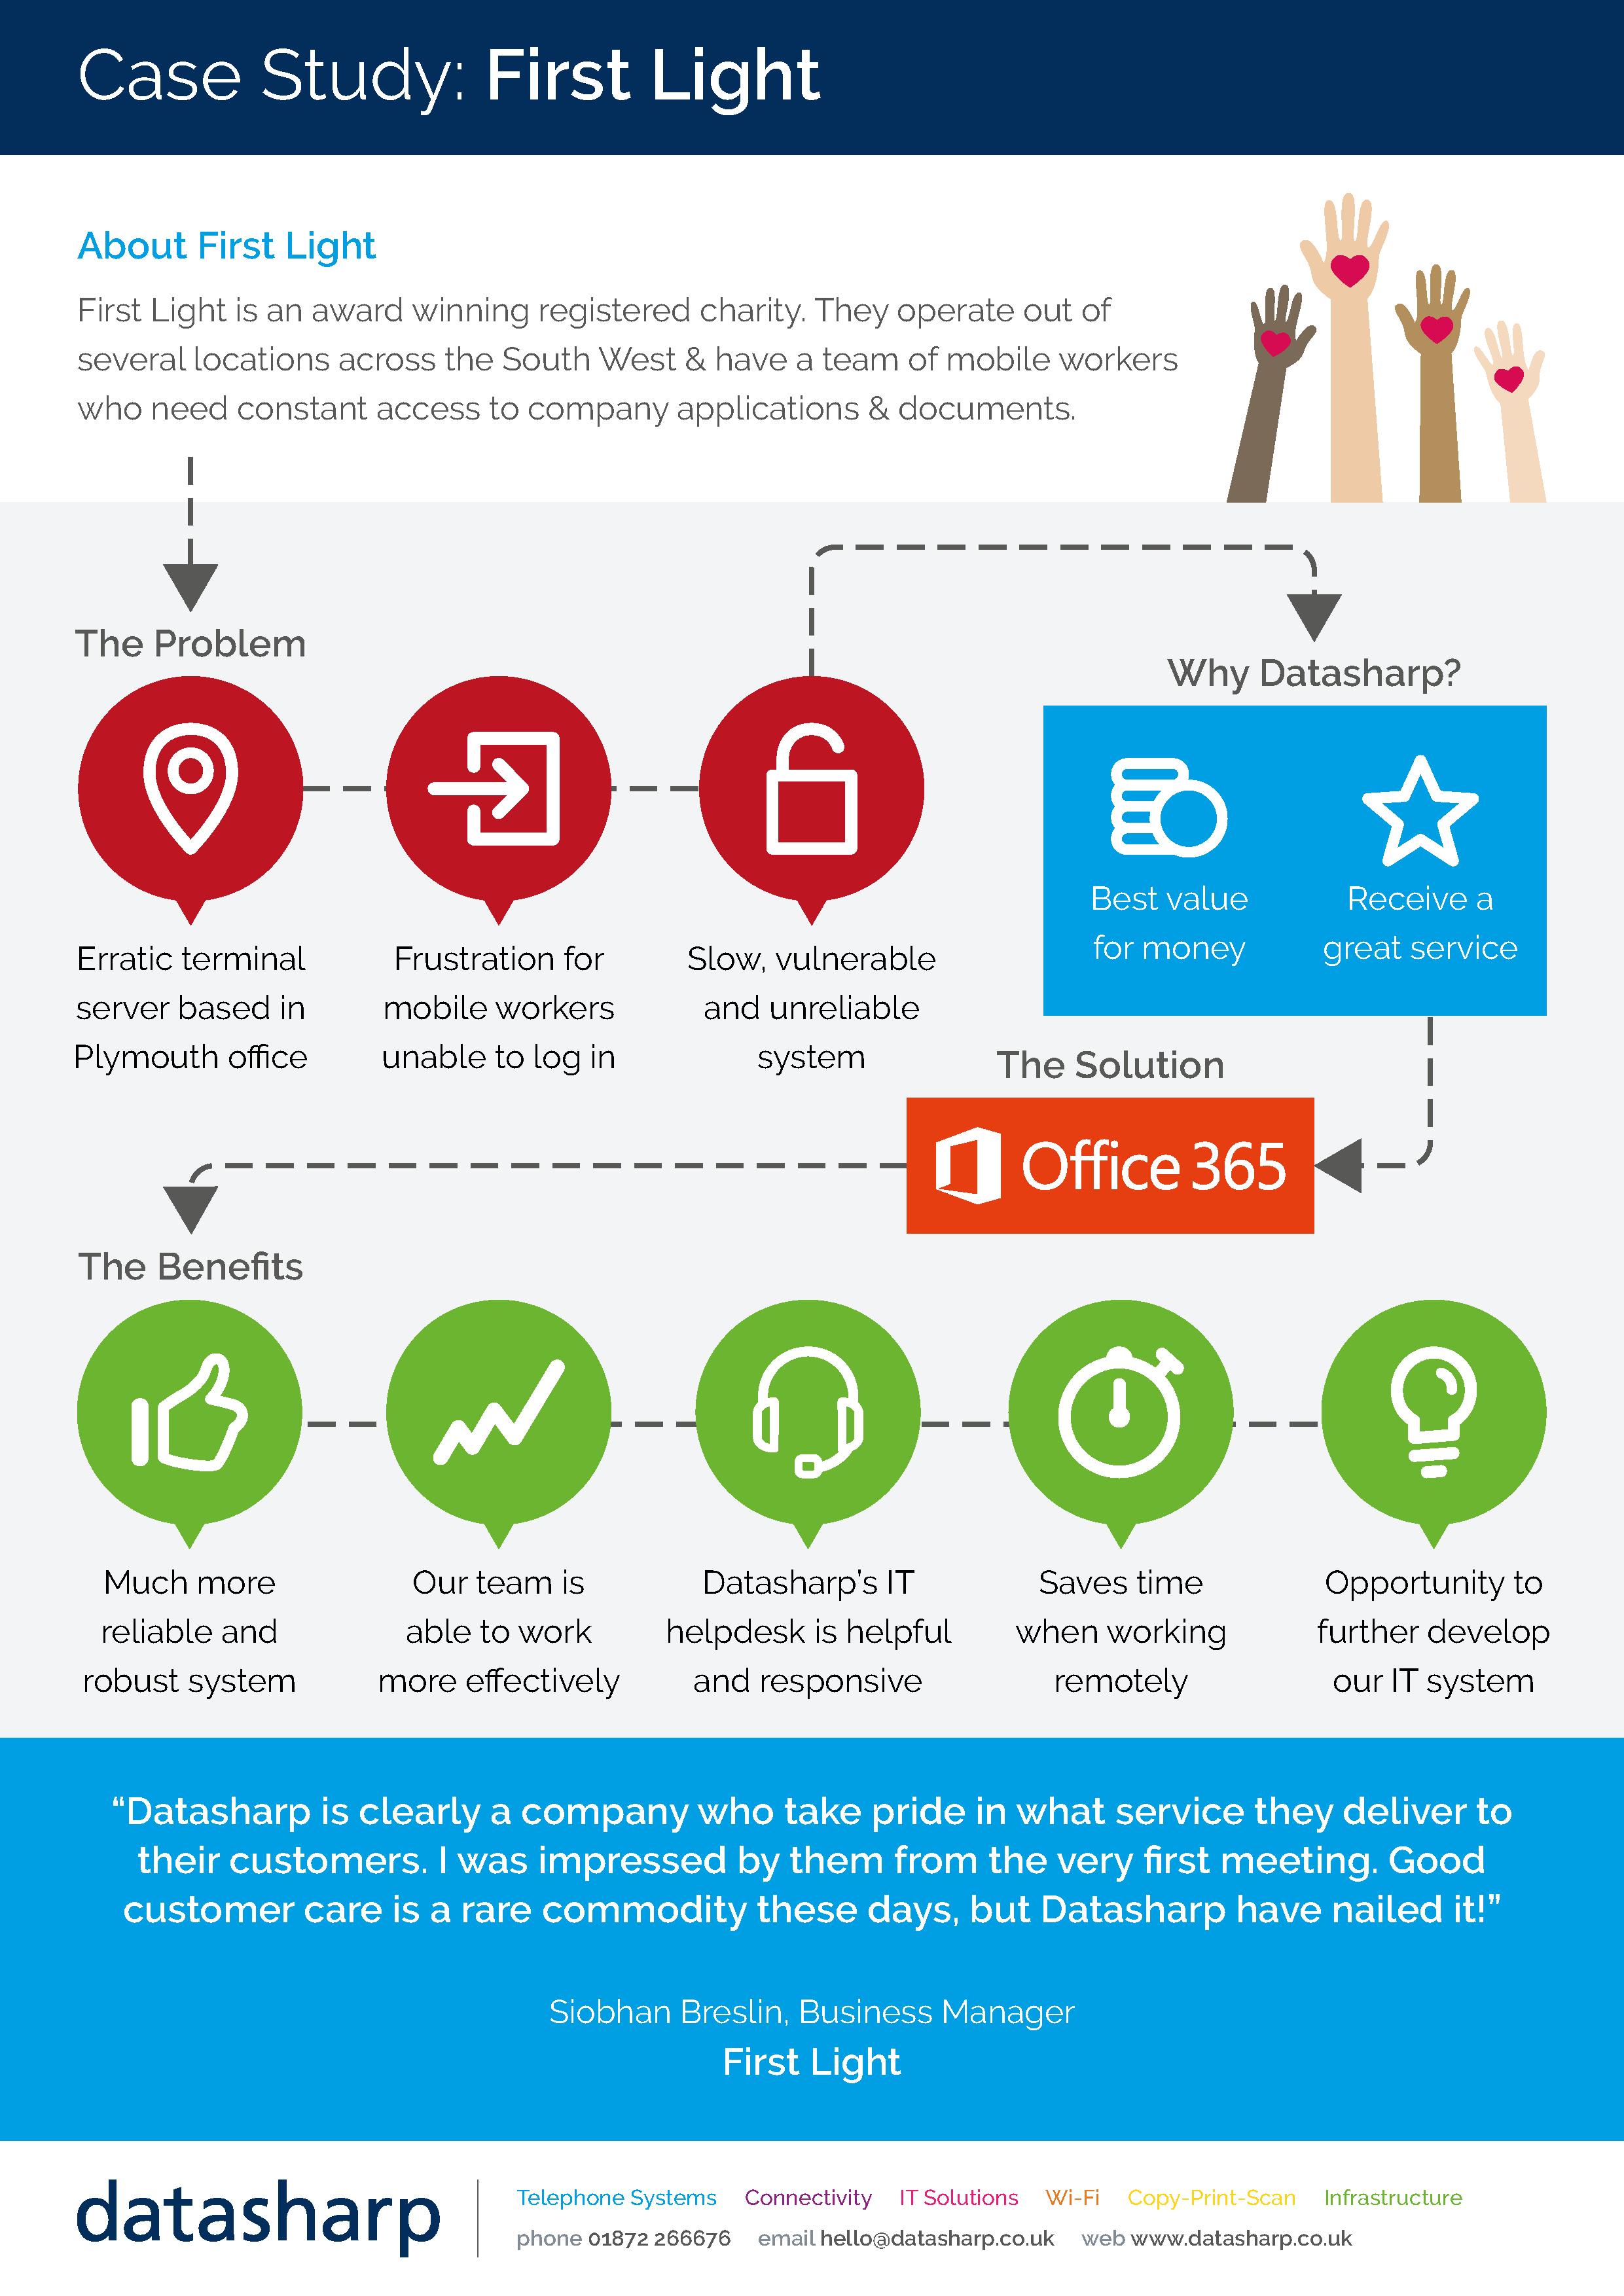 Case Study First Light Office 365